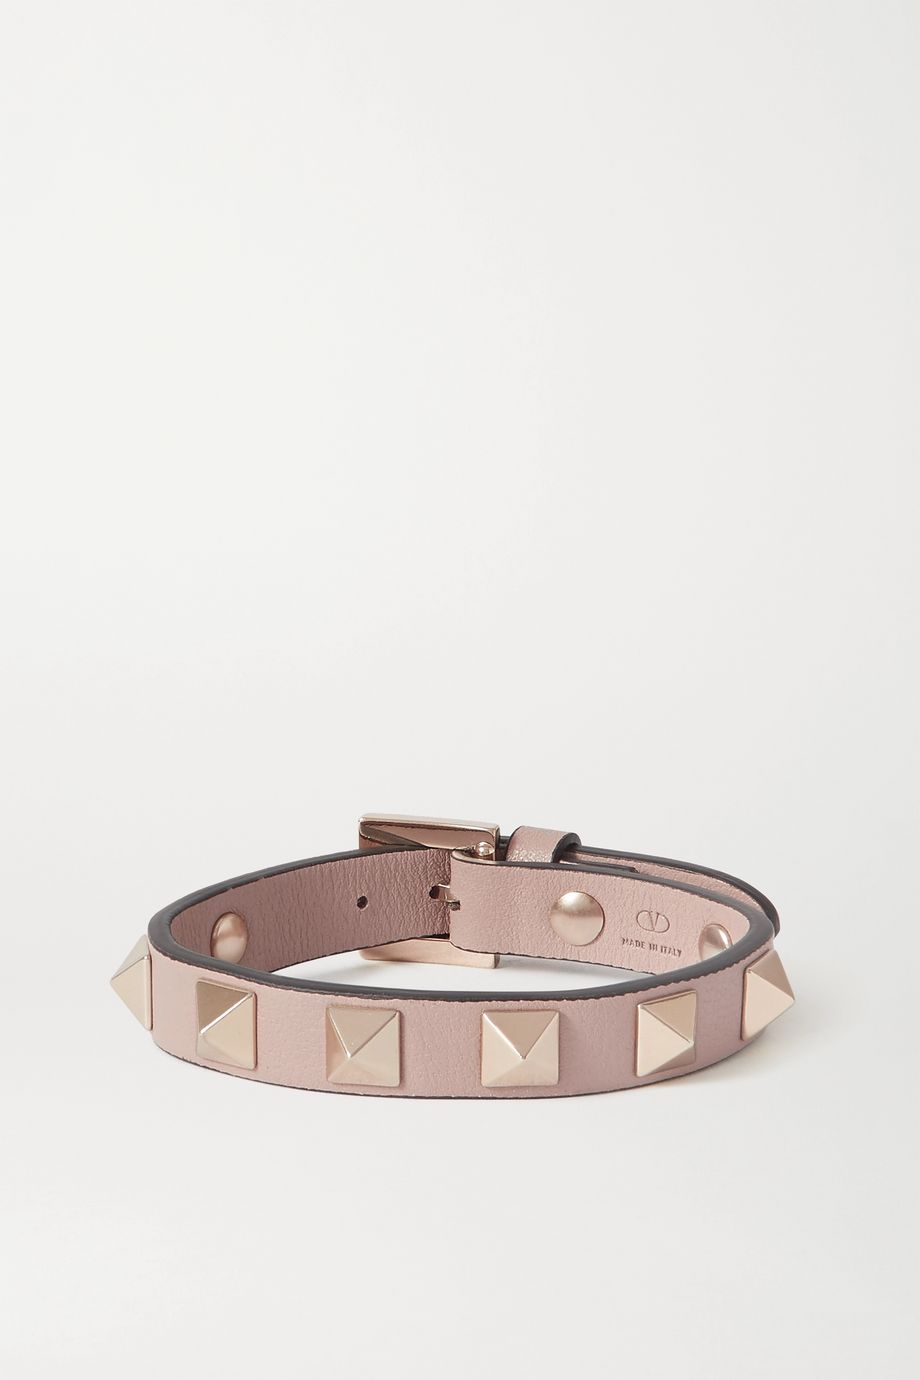 Valentino Valentino Garavani Rockstud Armband aus Leder